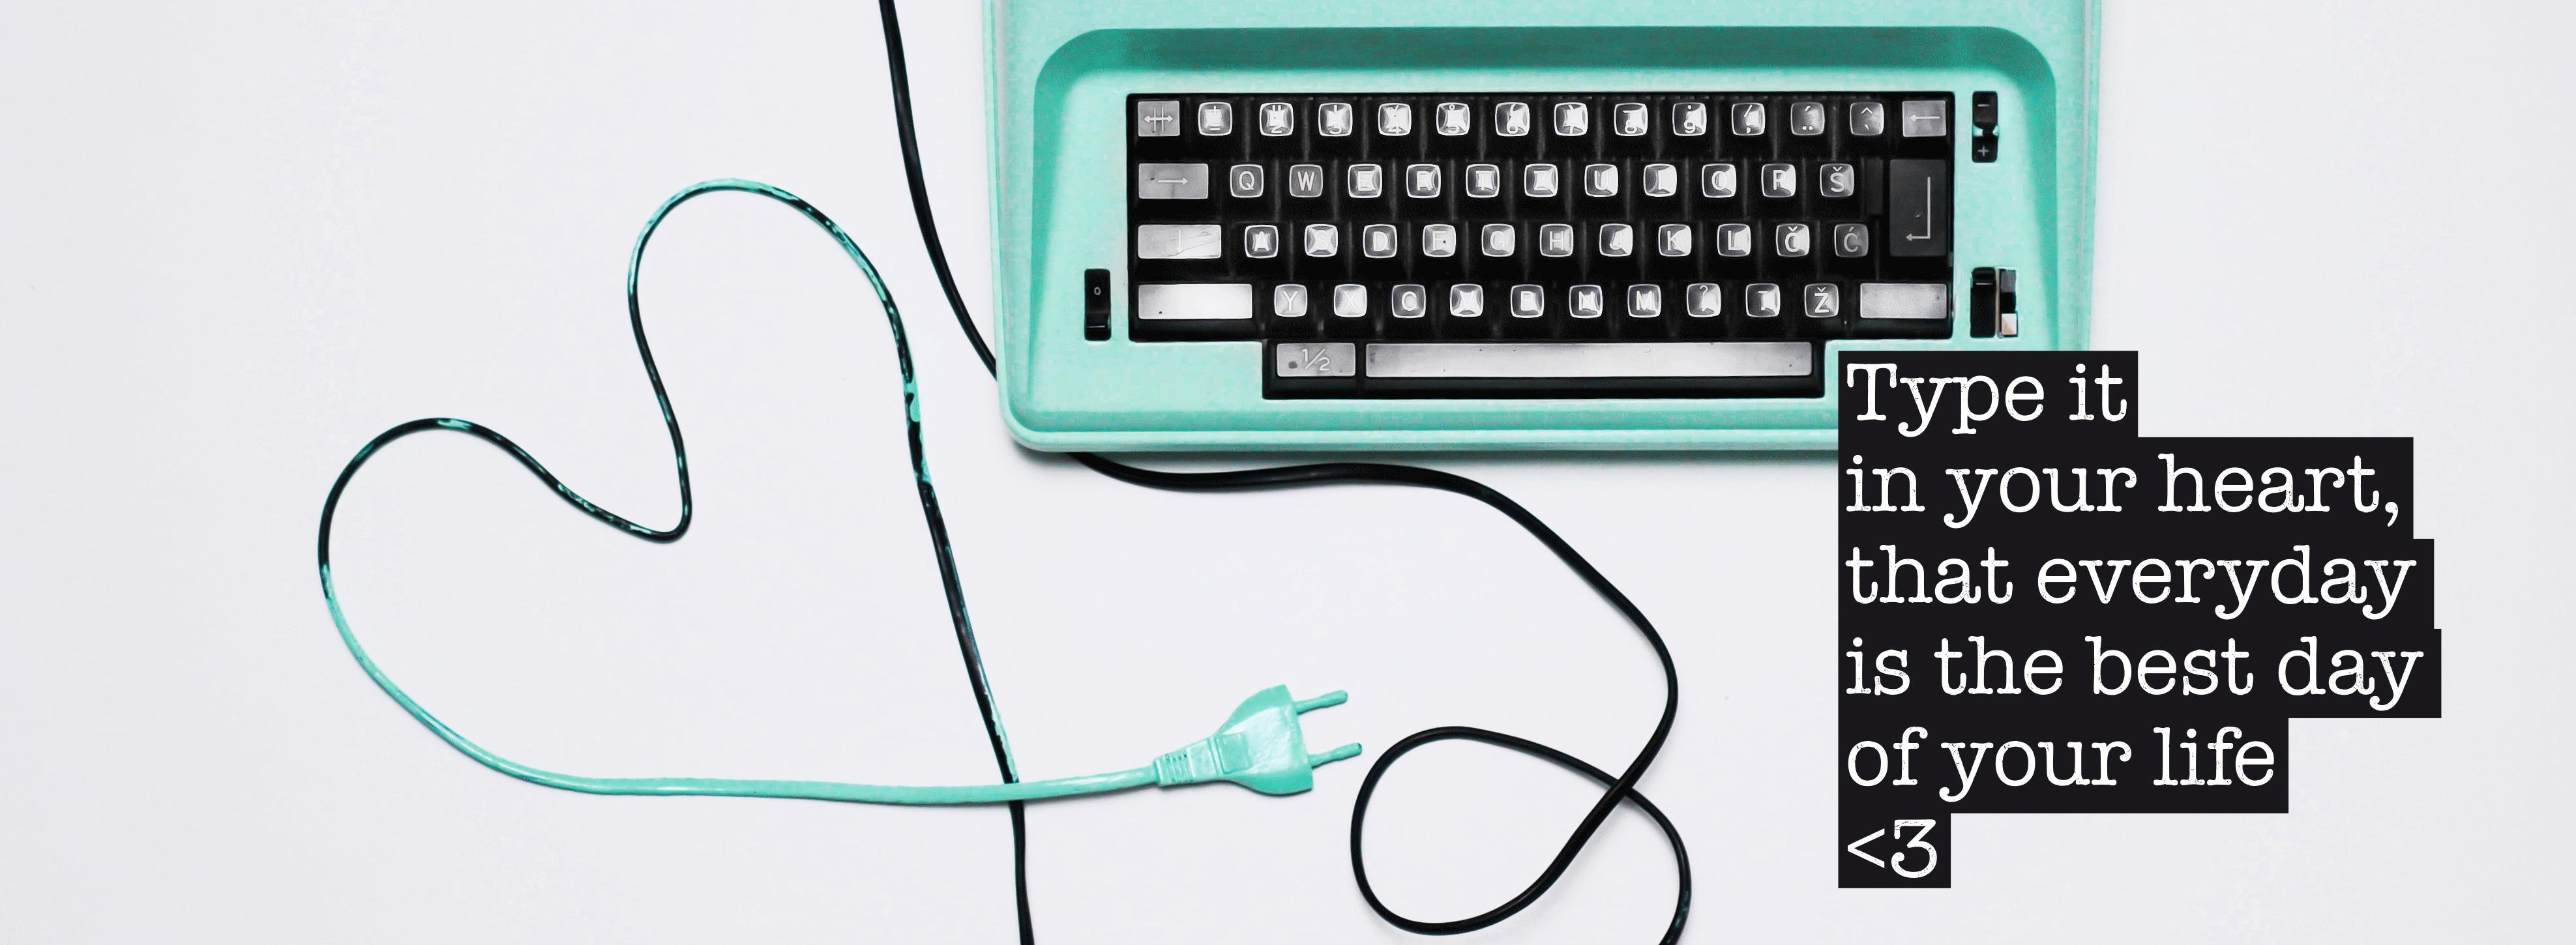 typewriter_christina_web_slider_small